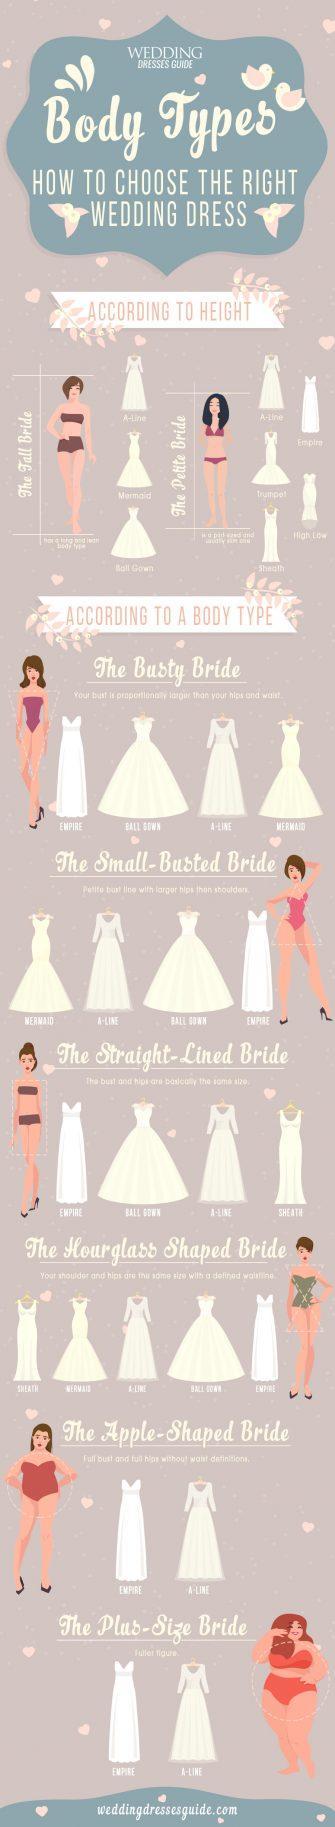 wedding dress for body type infographics